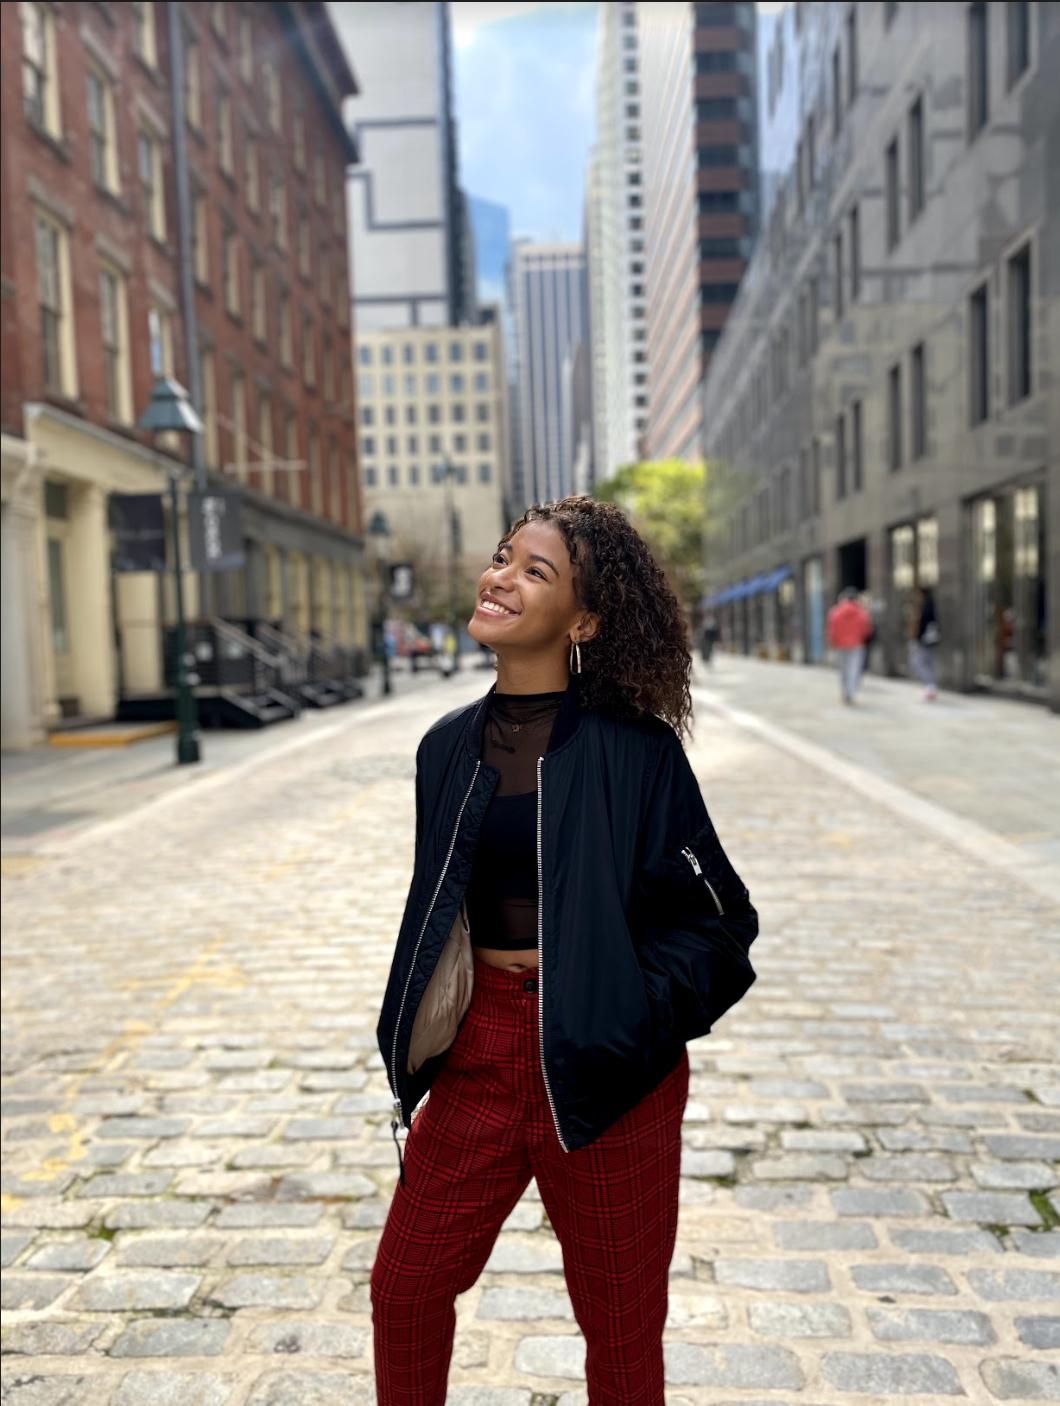 Gabrielle smiling on a cobblestone street.